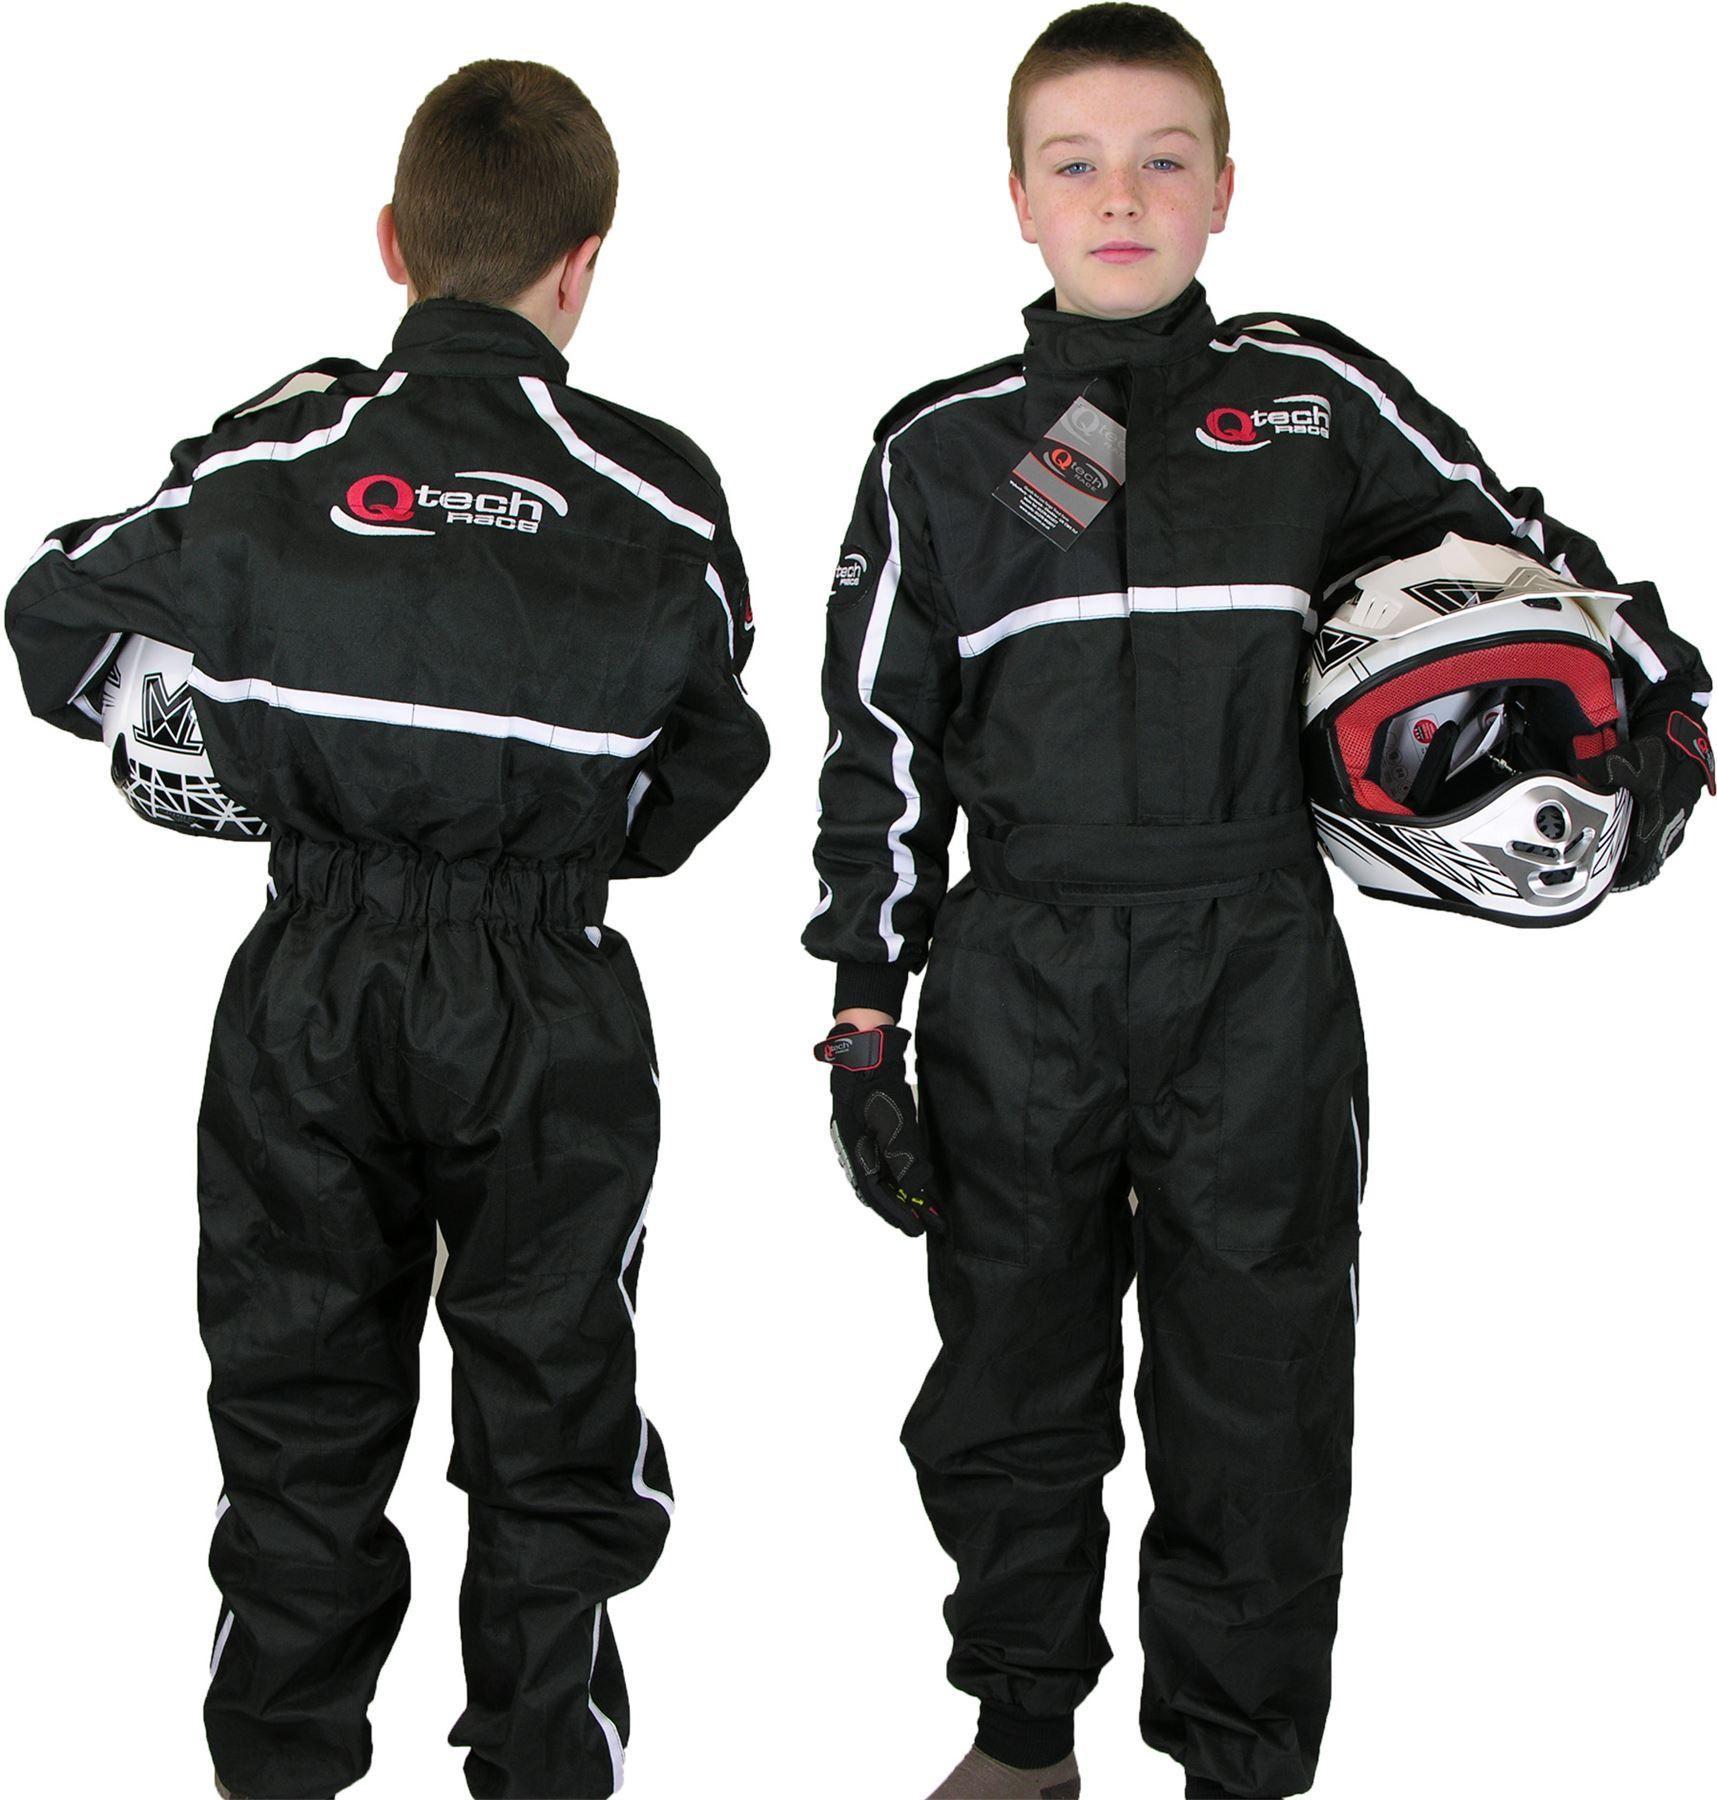 Childrens Kids Race Suit Overalls Karting Motocross Dirt Bike By Qtech Racing Suit Kids Races Motocross Racing